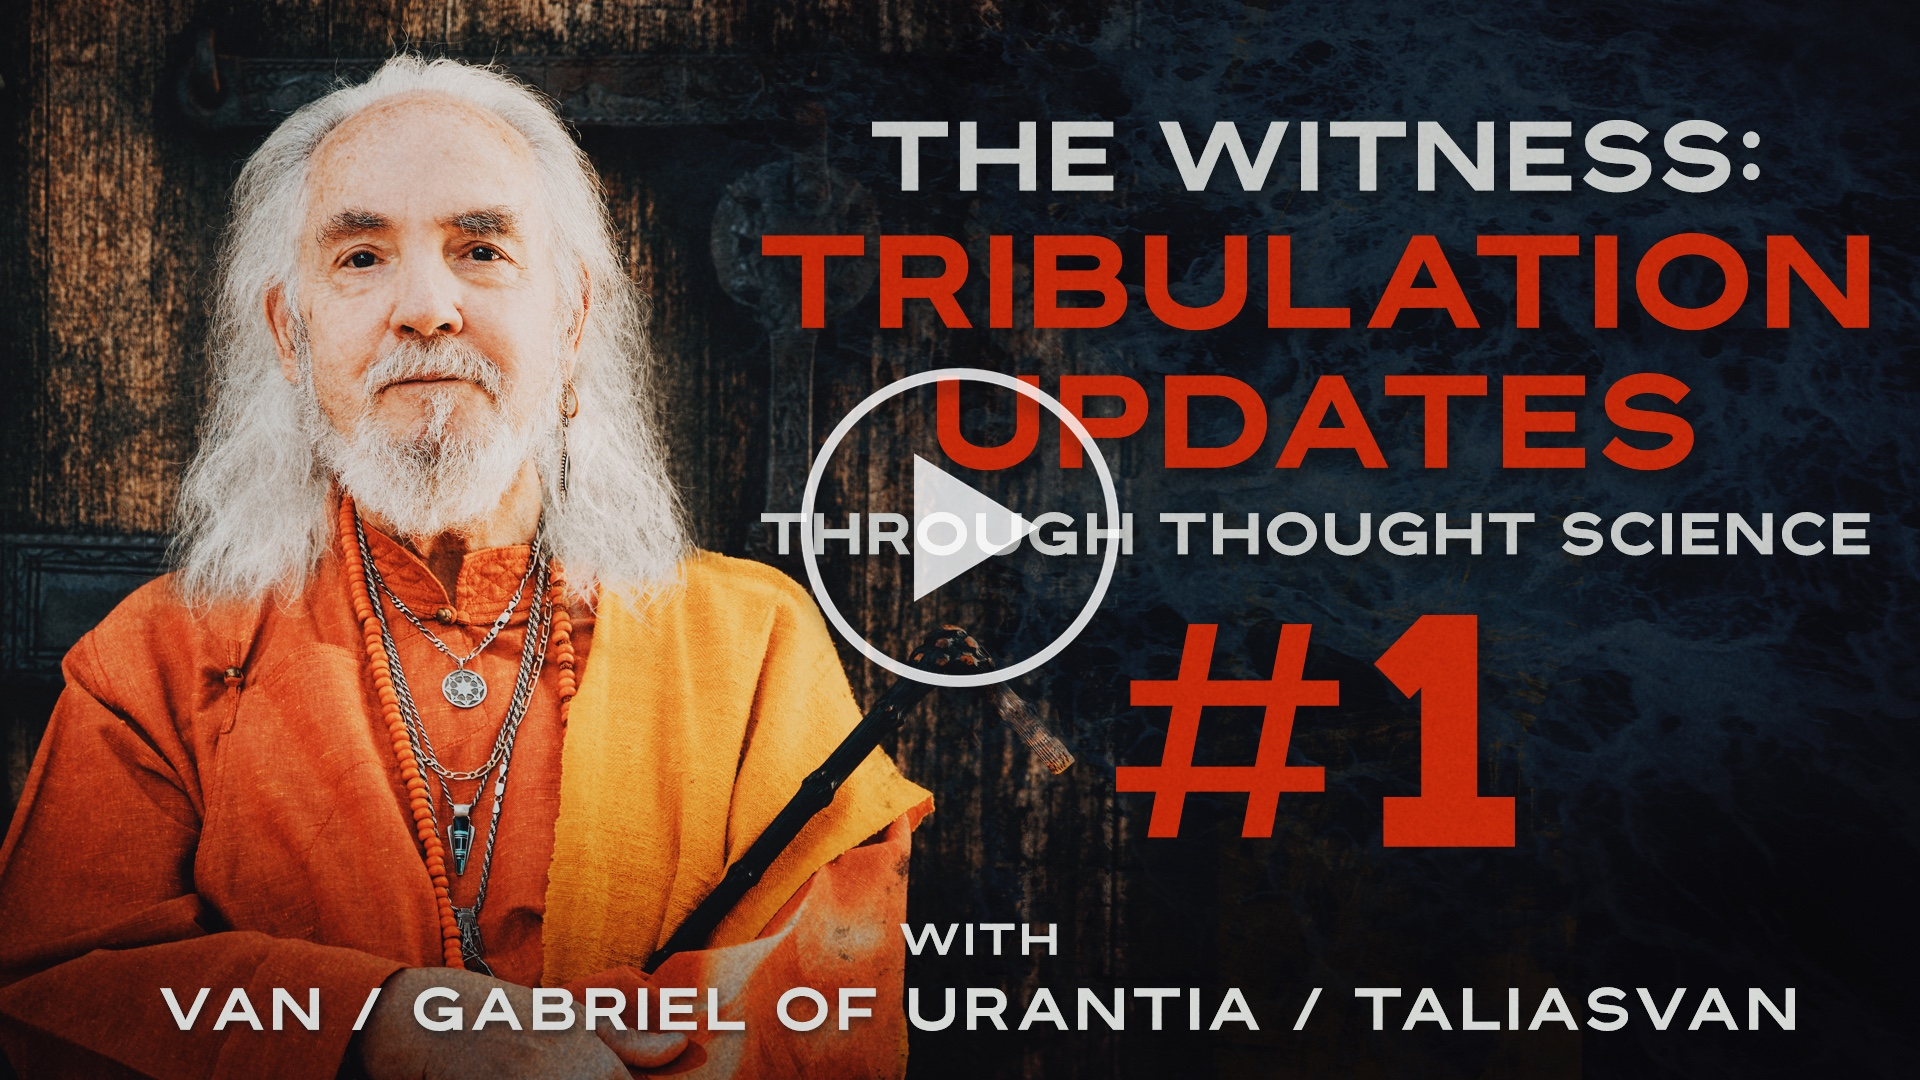 The Witness: Tribulation Updates Through Thought Science #1 | Van / Gabriel of Urantia / TaliasVan